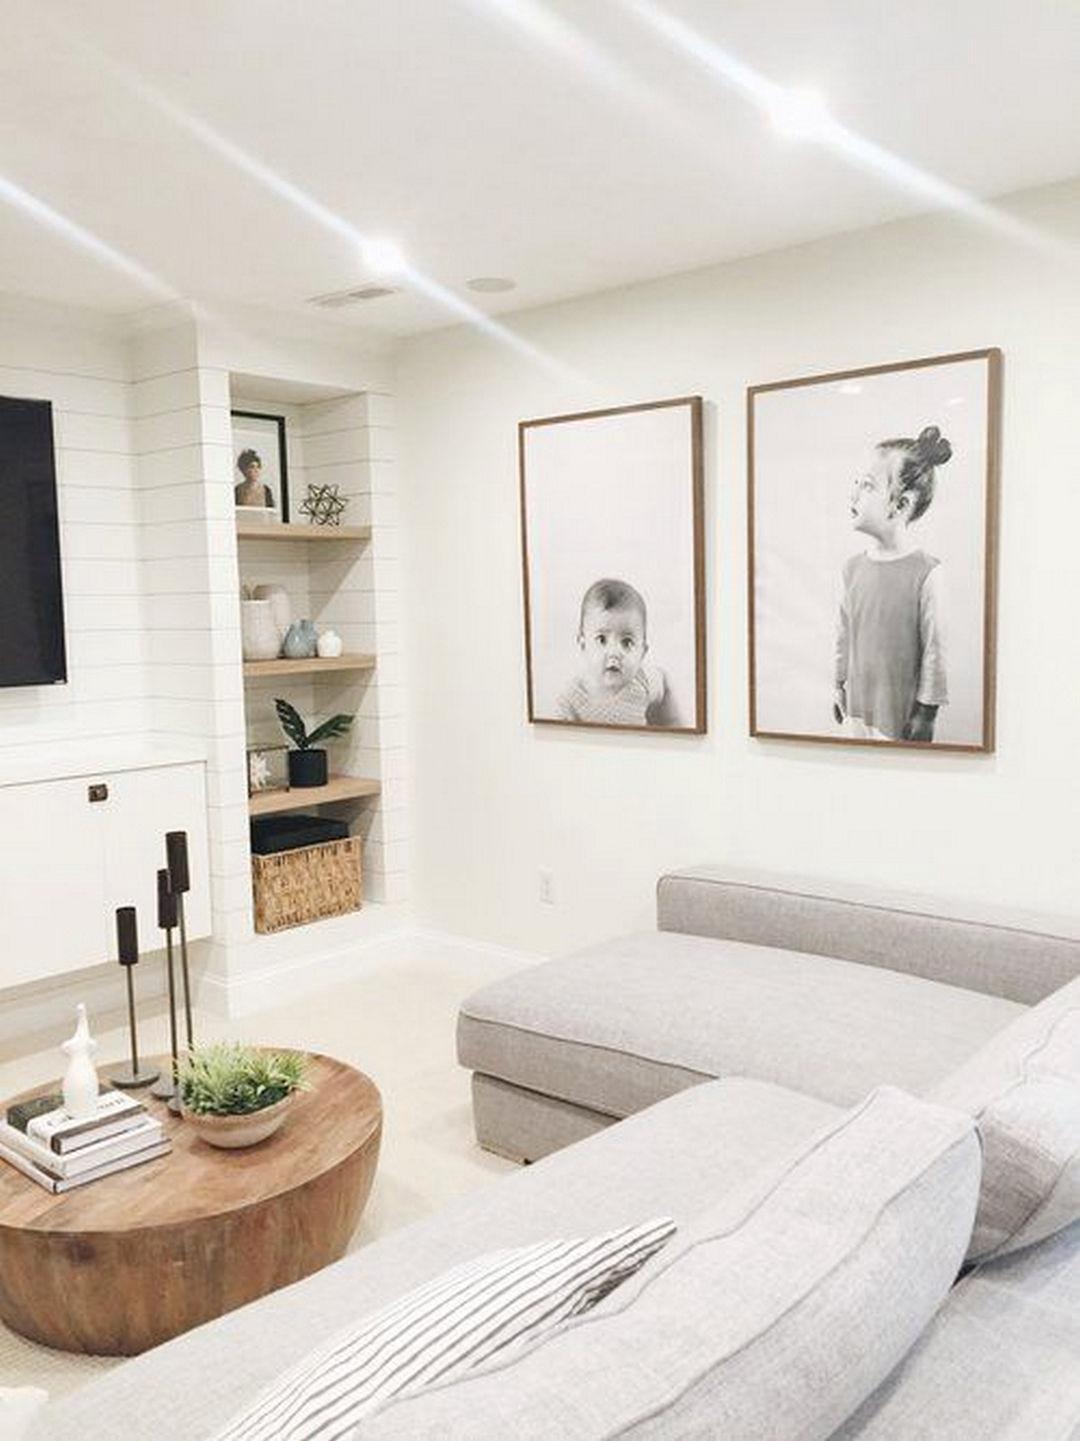 Super Cozy Living Room Interiors: 80 Ideas You Should Try https ...